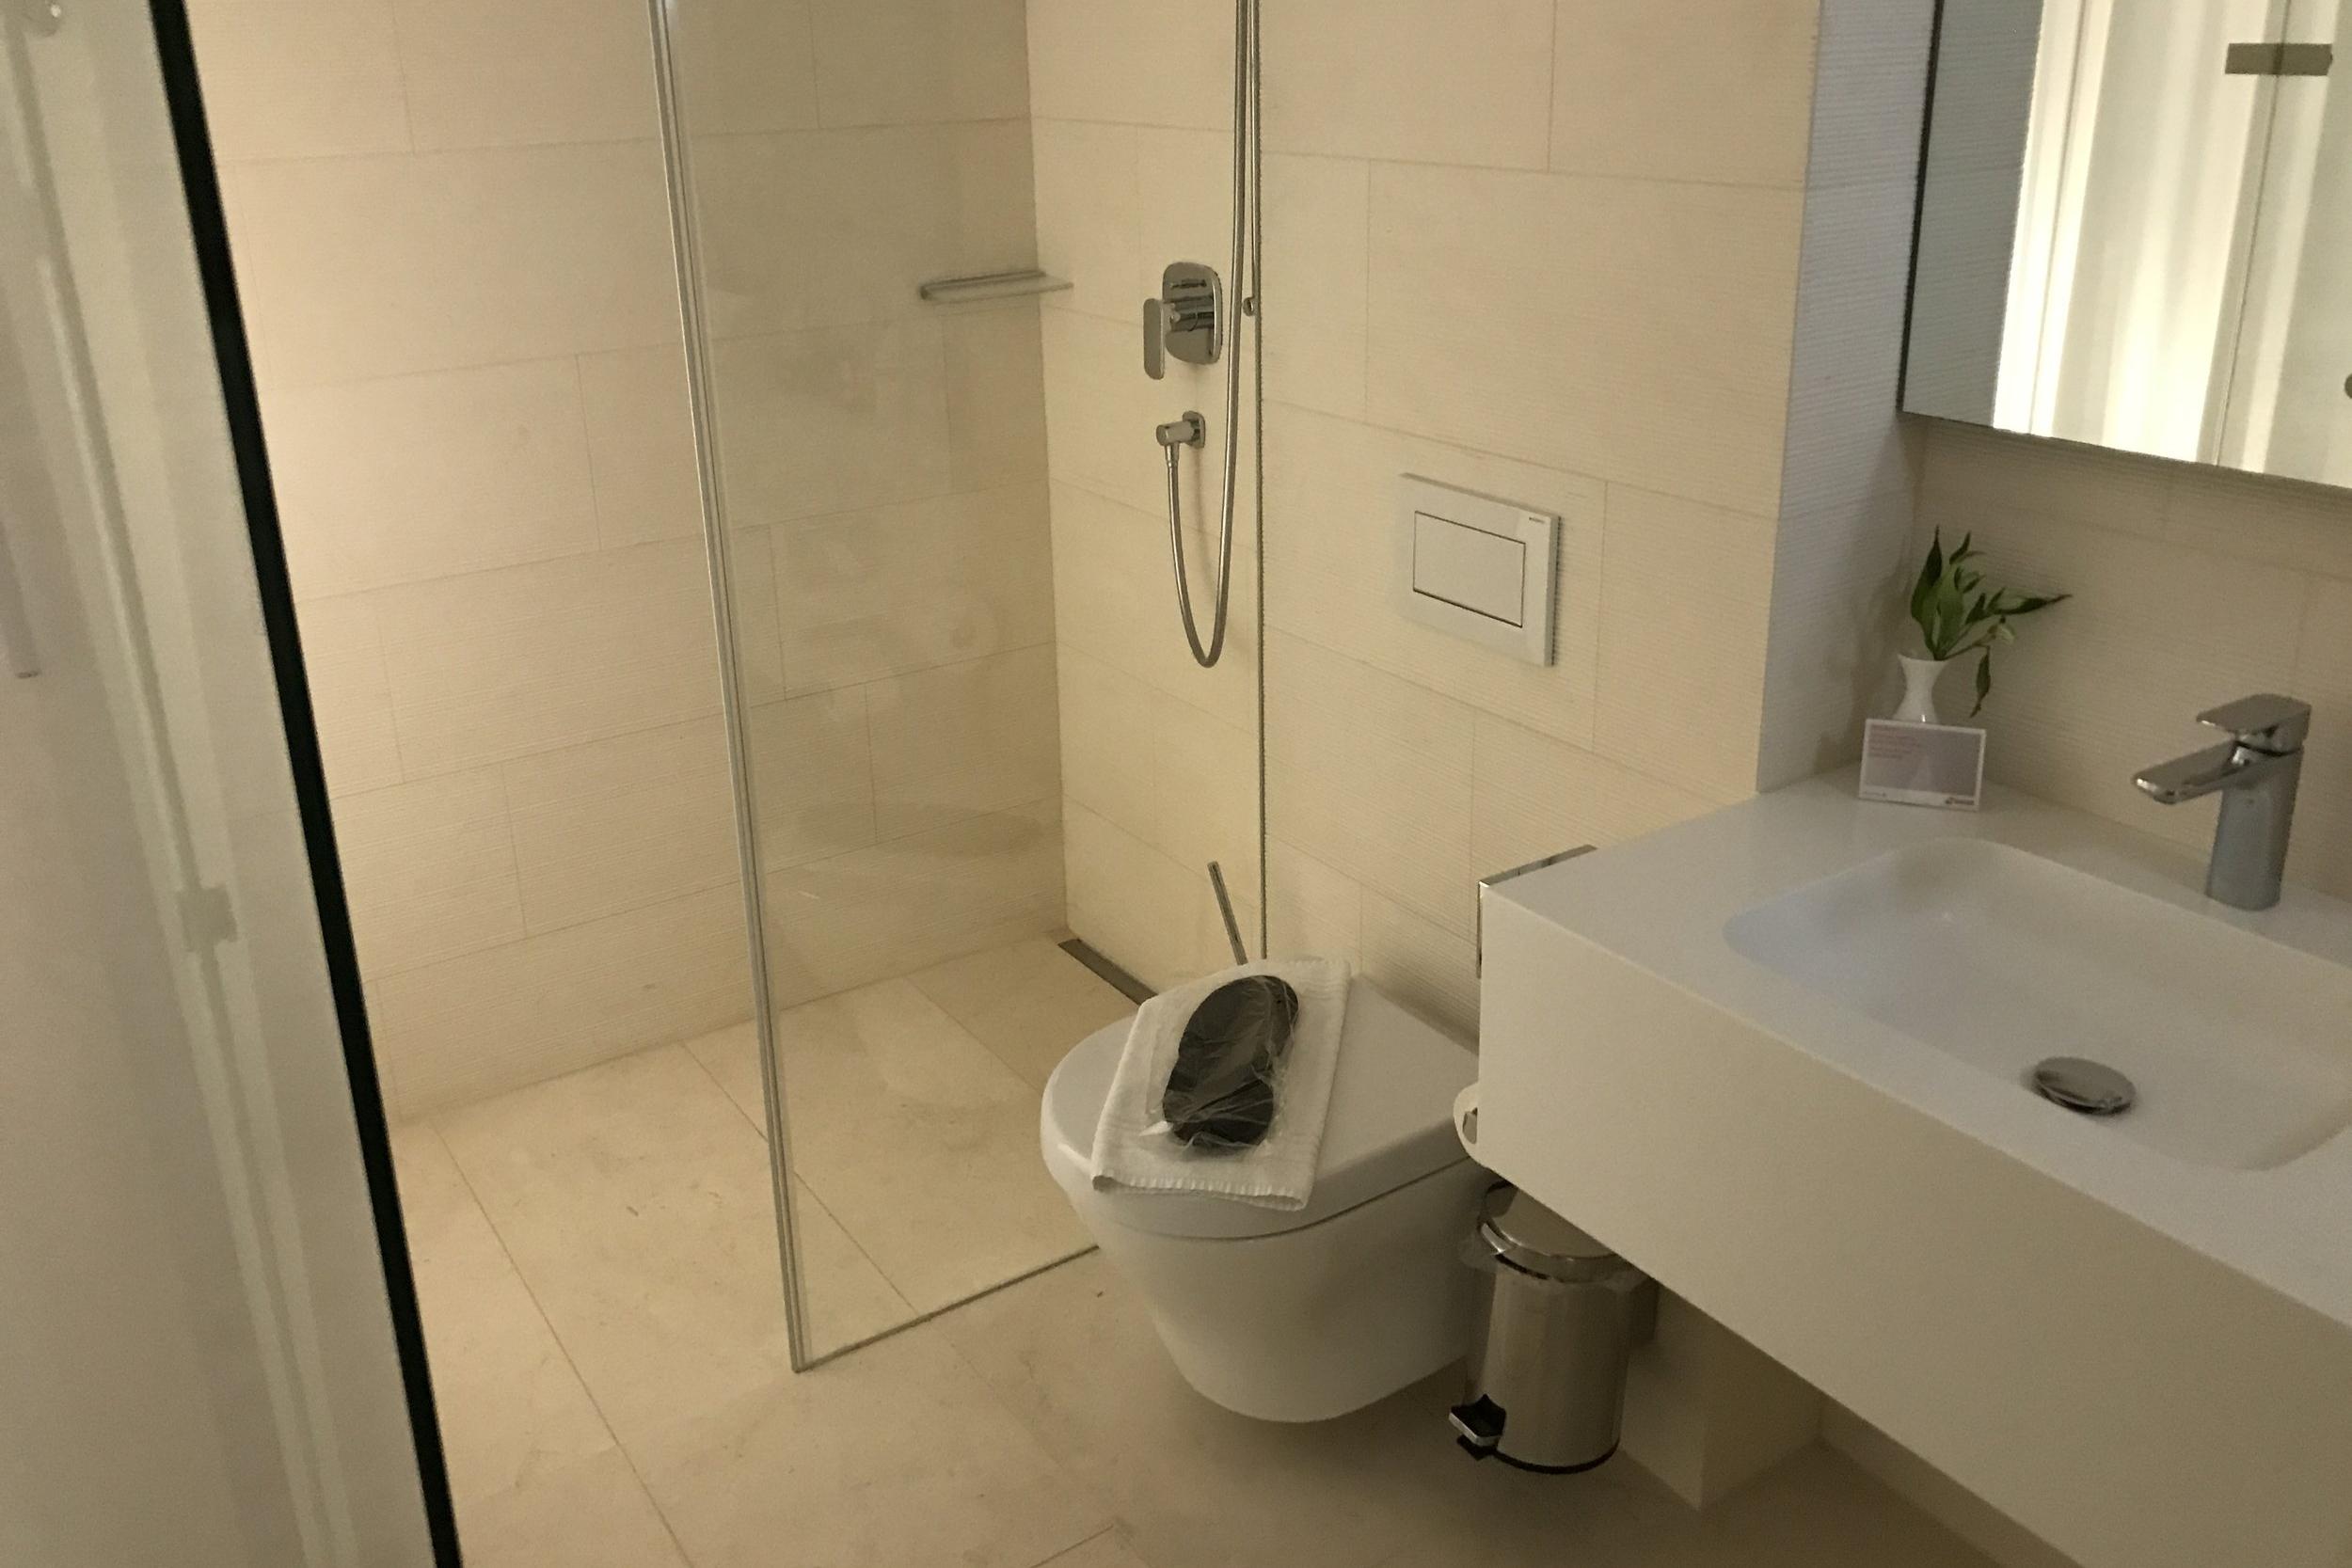 Swiss First Class Lounge Zurich – Day room ensuite bathroom